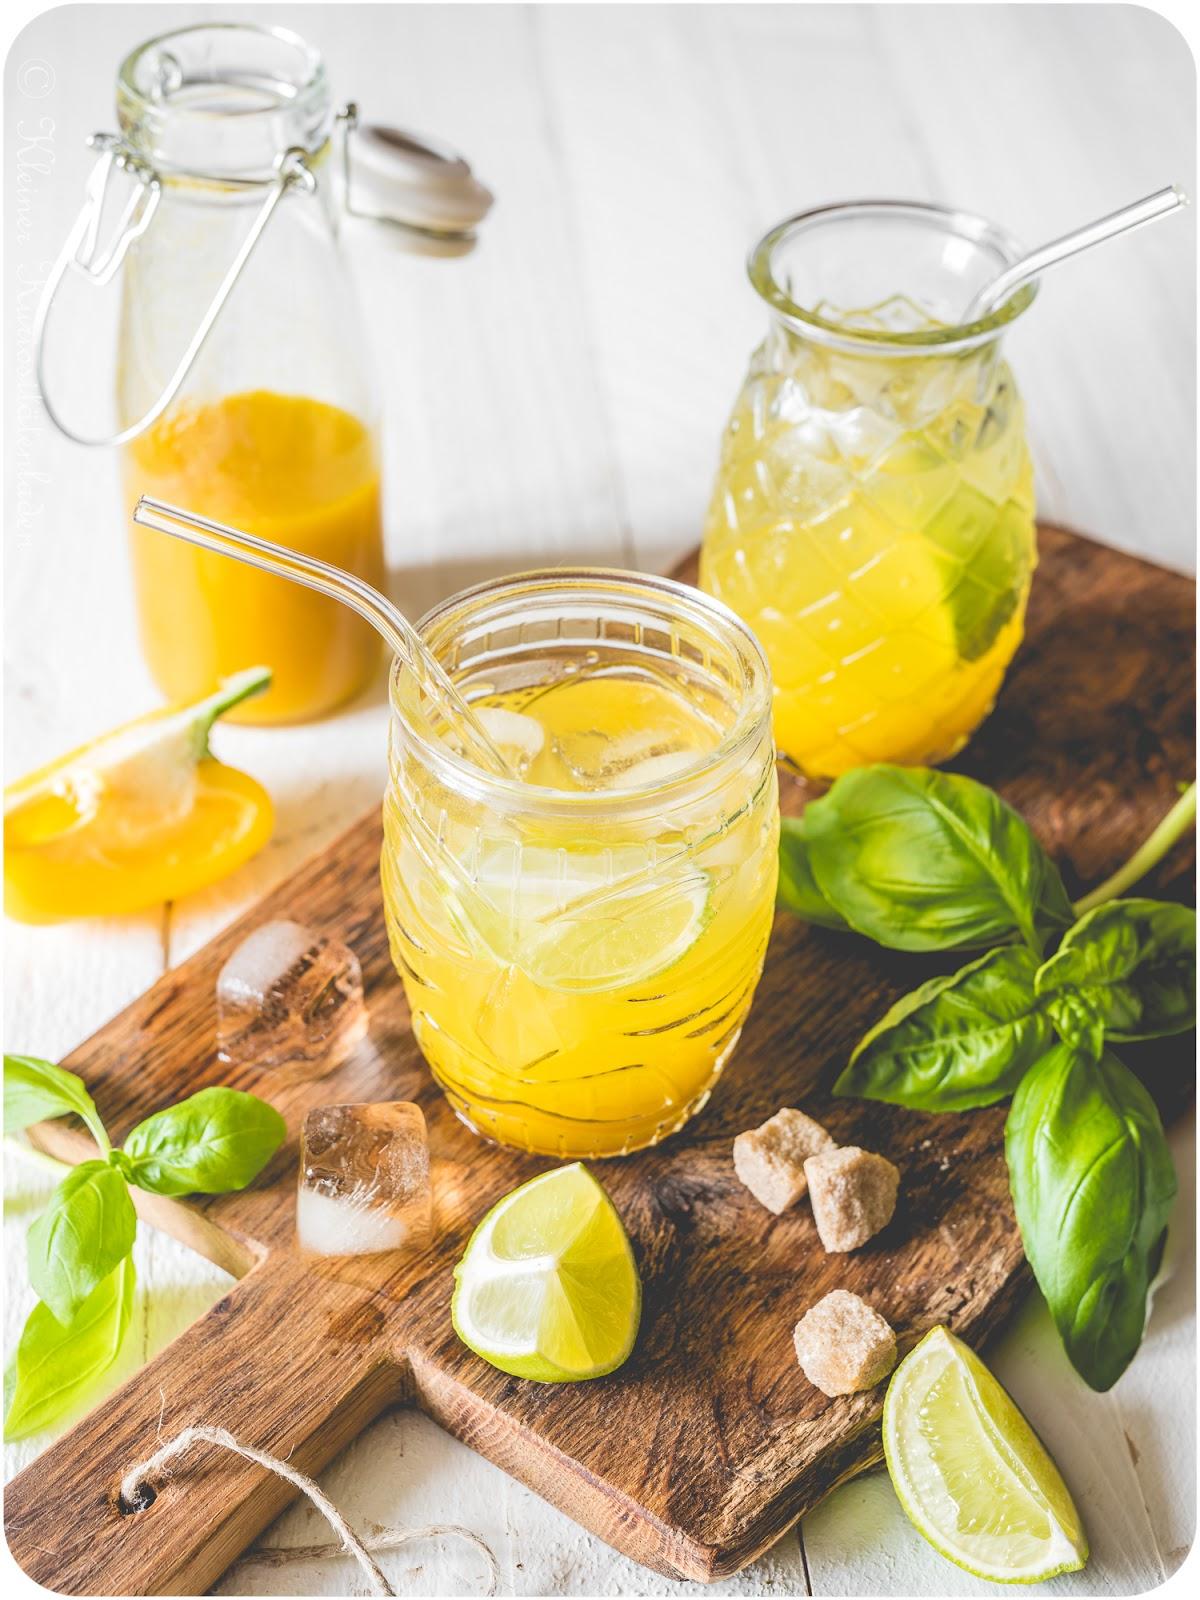 Paprika-Basilikum-Limonade